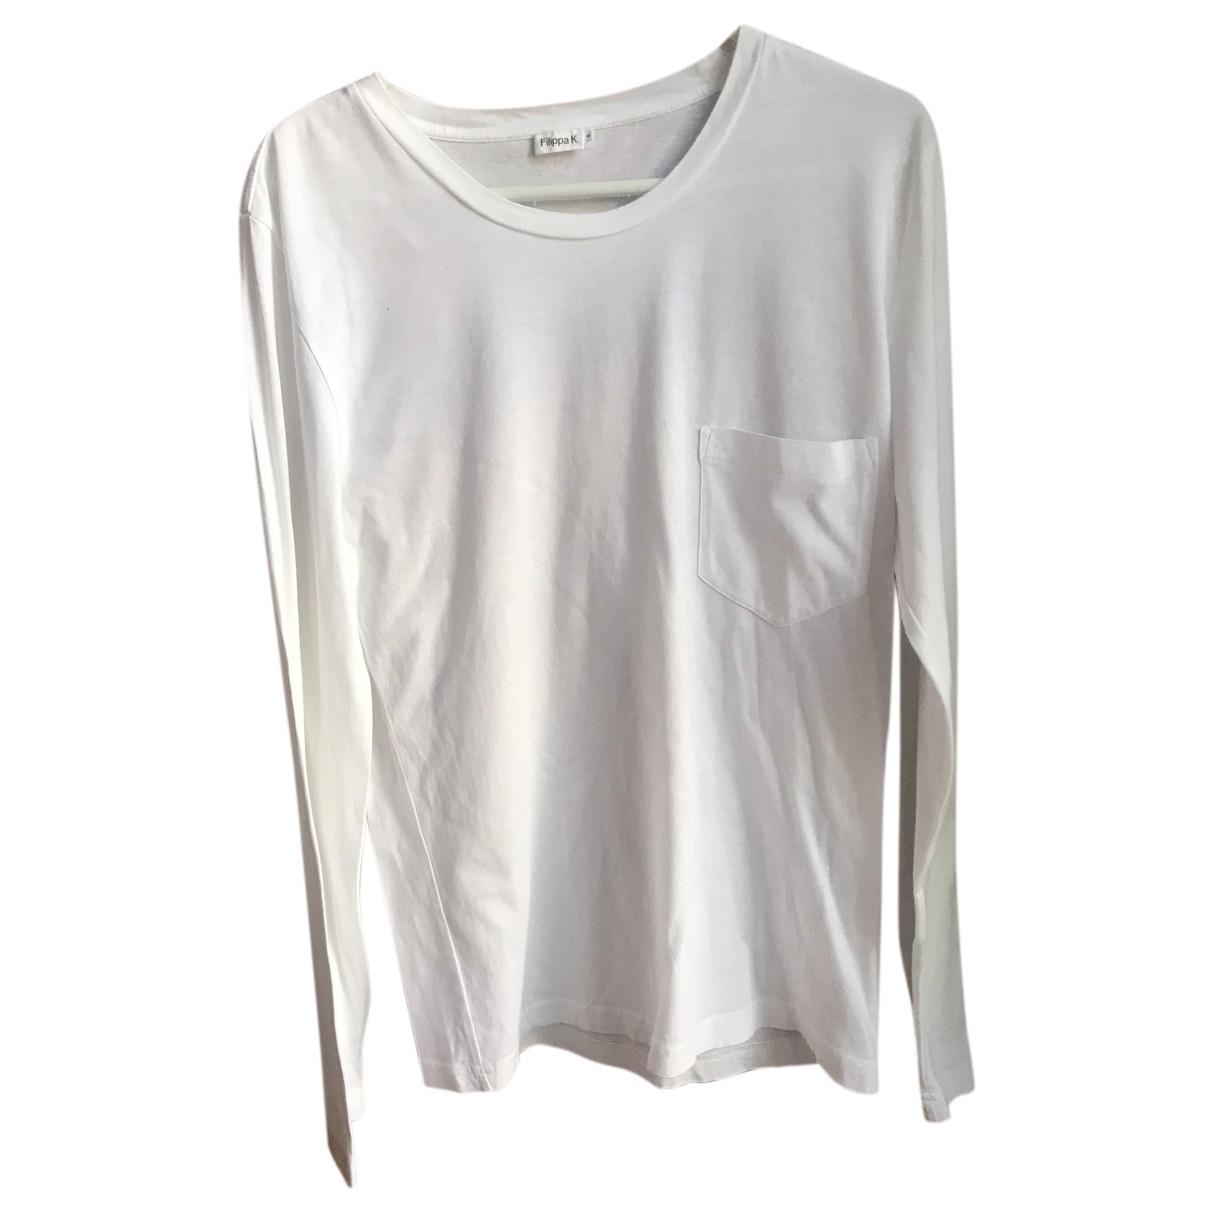 Filippa K - Tee shirts   pour homme en coton - blanc